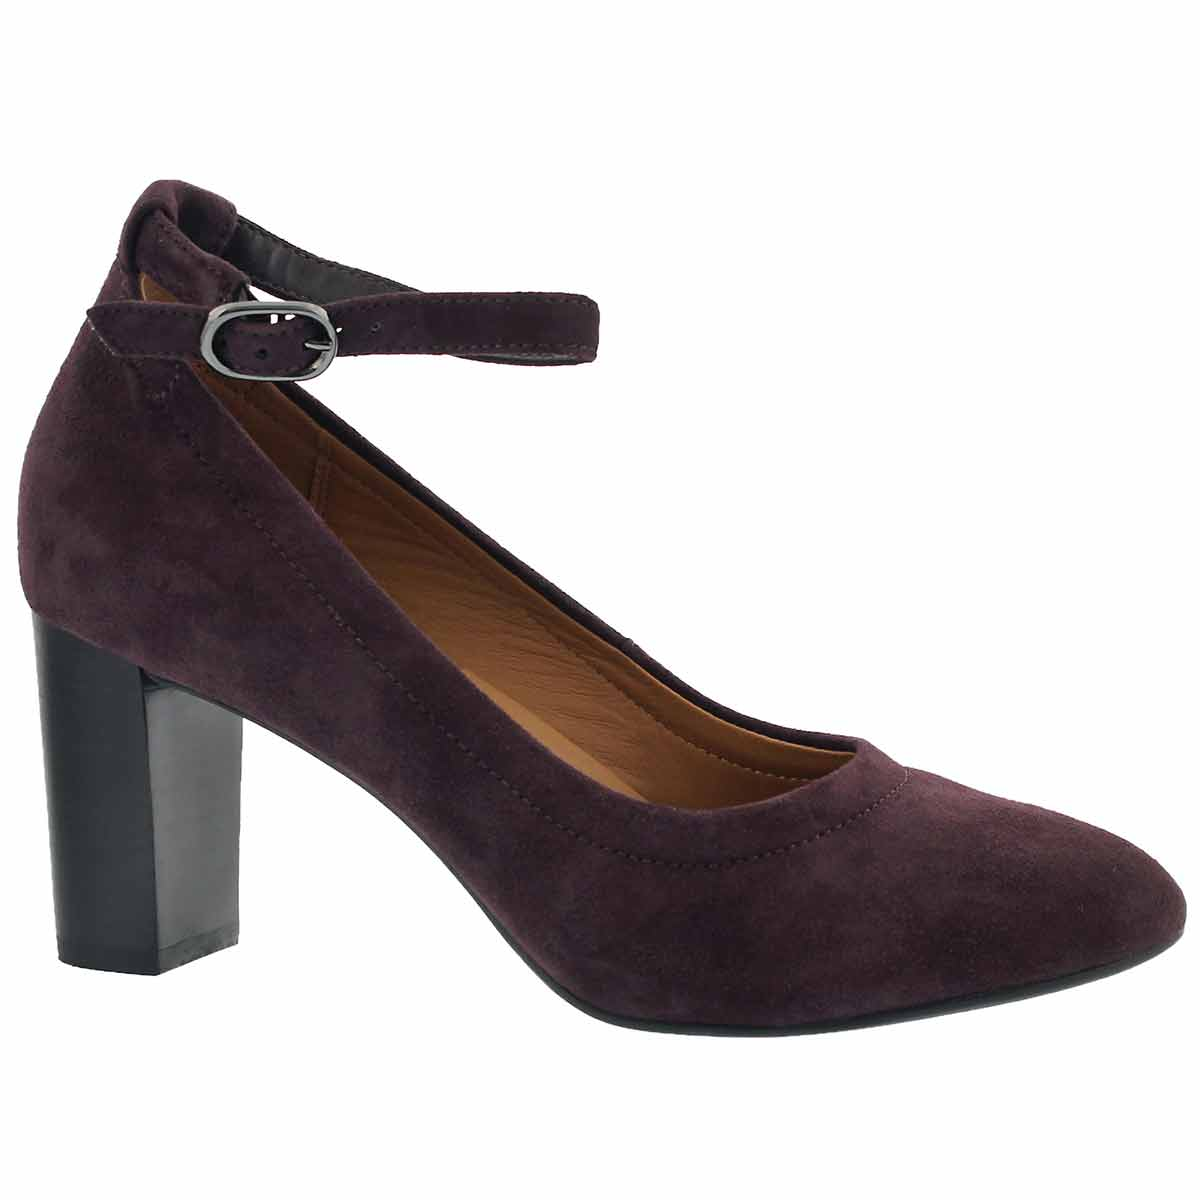 Women's CHRYSSA JANA auberg ankle strap heels